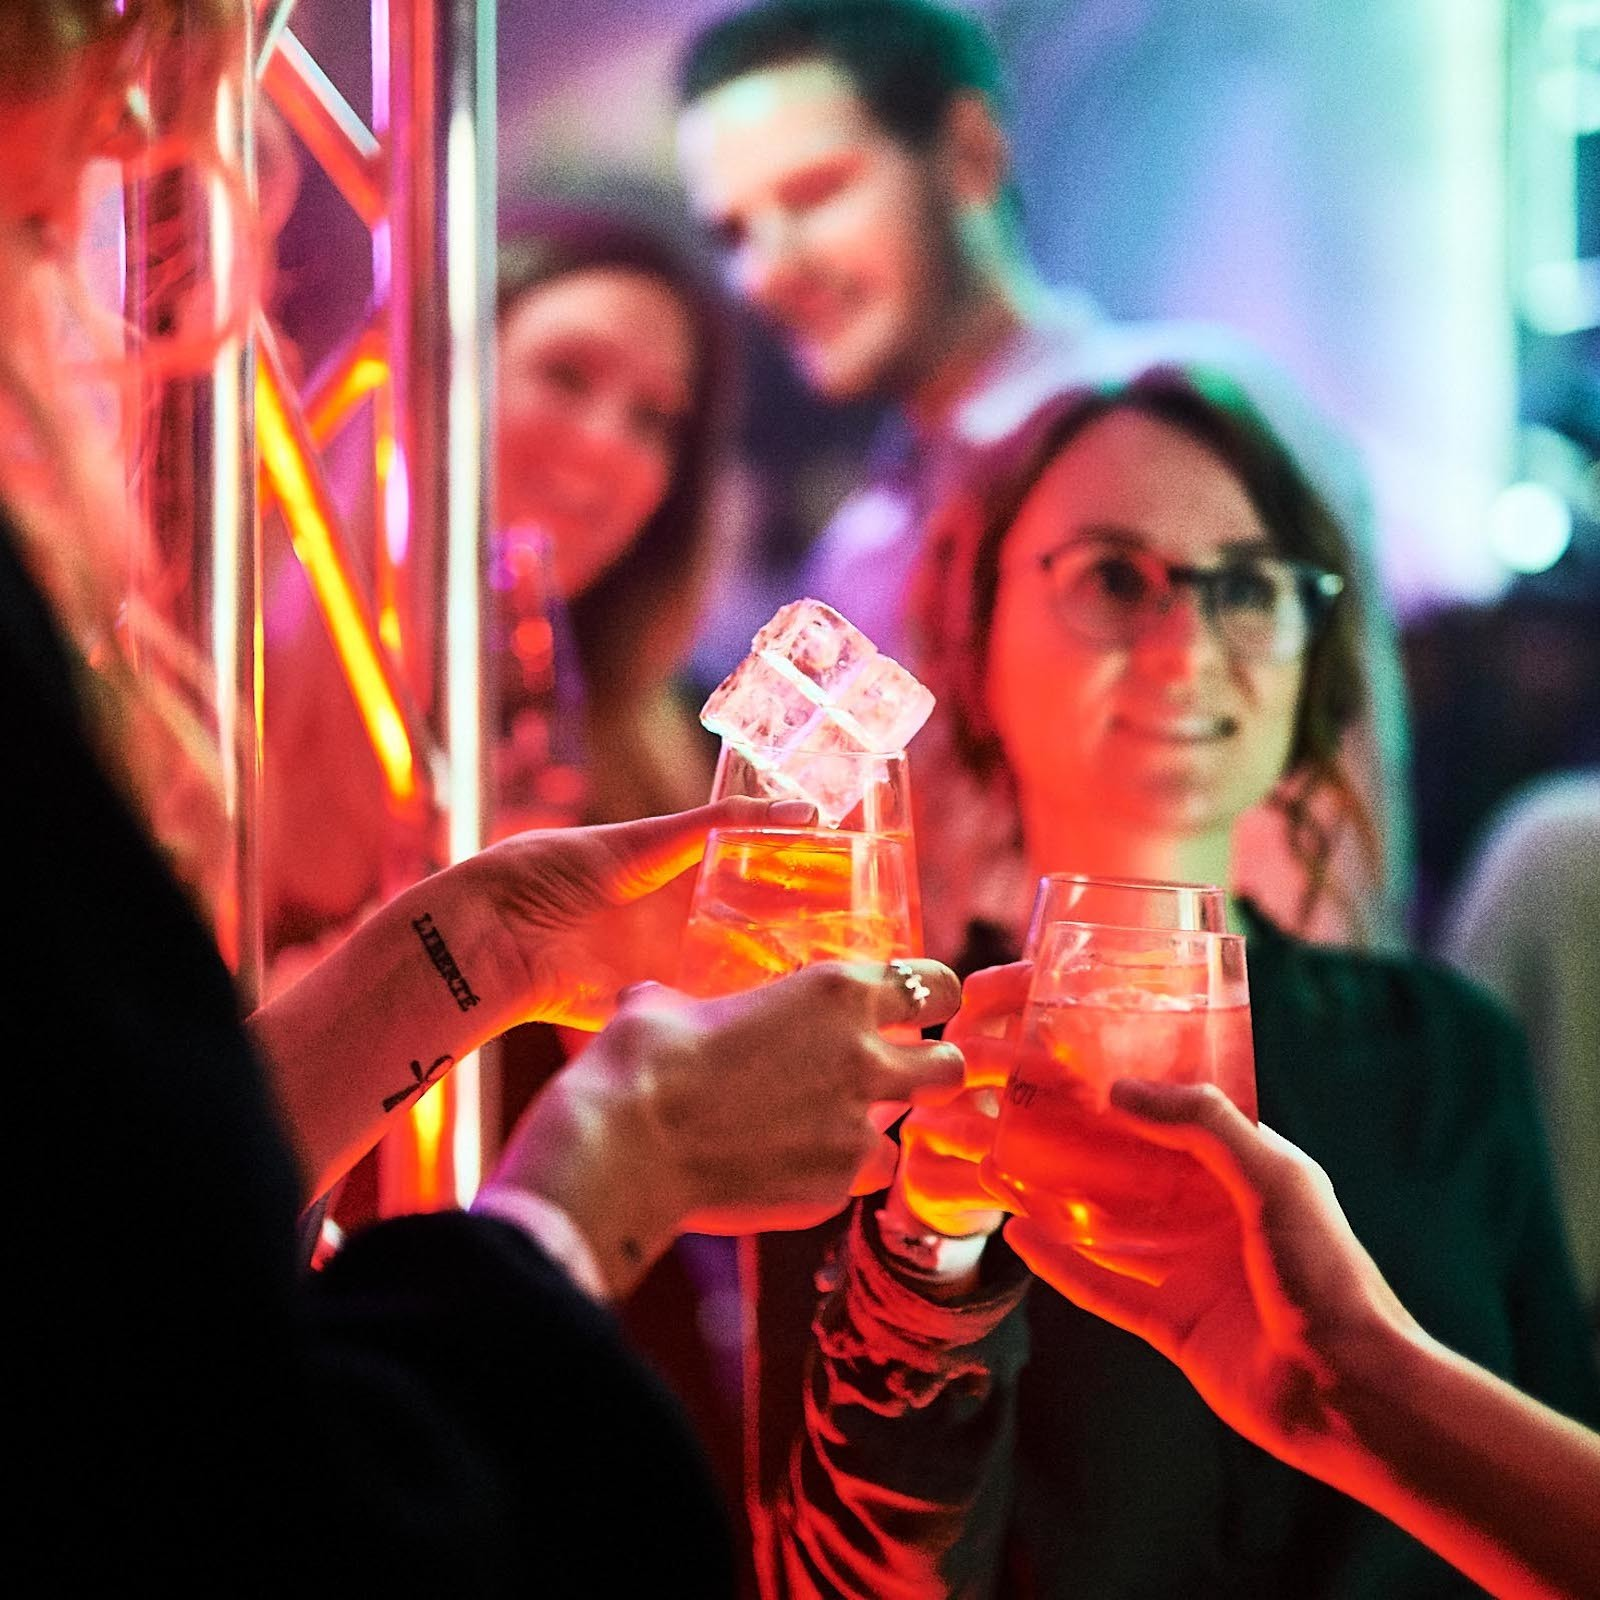 DJane | DJ | Hannover | Glitzerplatte | Party | Event | Gesang | Sängerin | Club | Wedding | Event | Messe | Charity | Gala | Buchen | Mieten